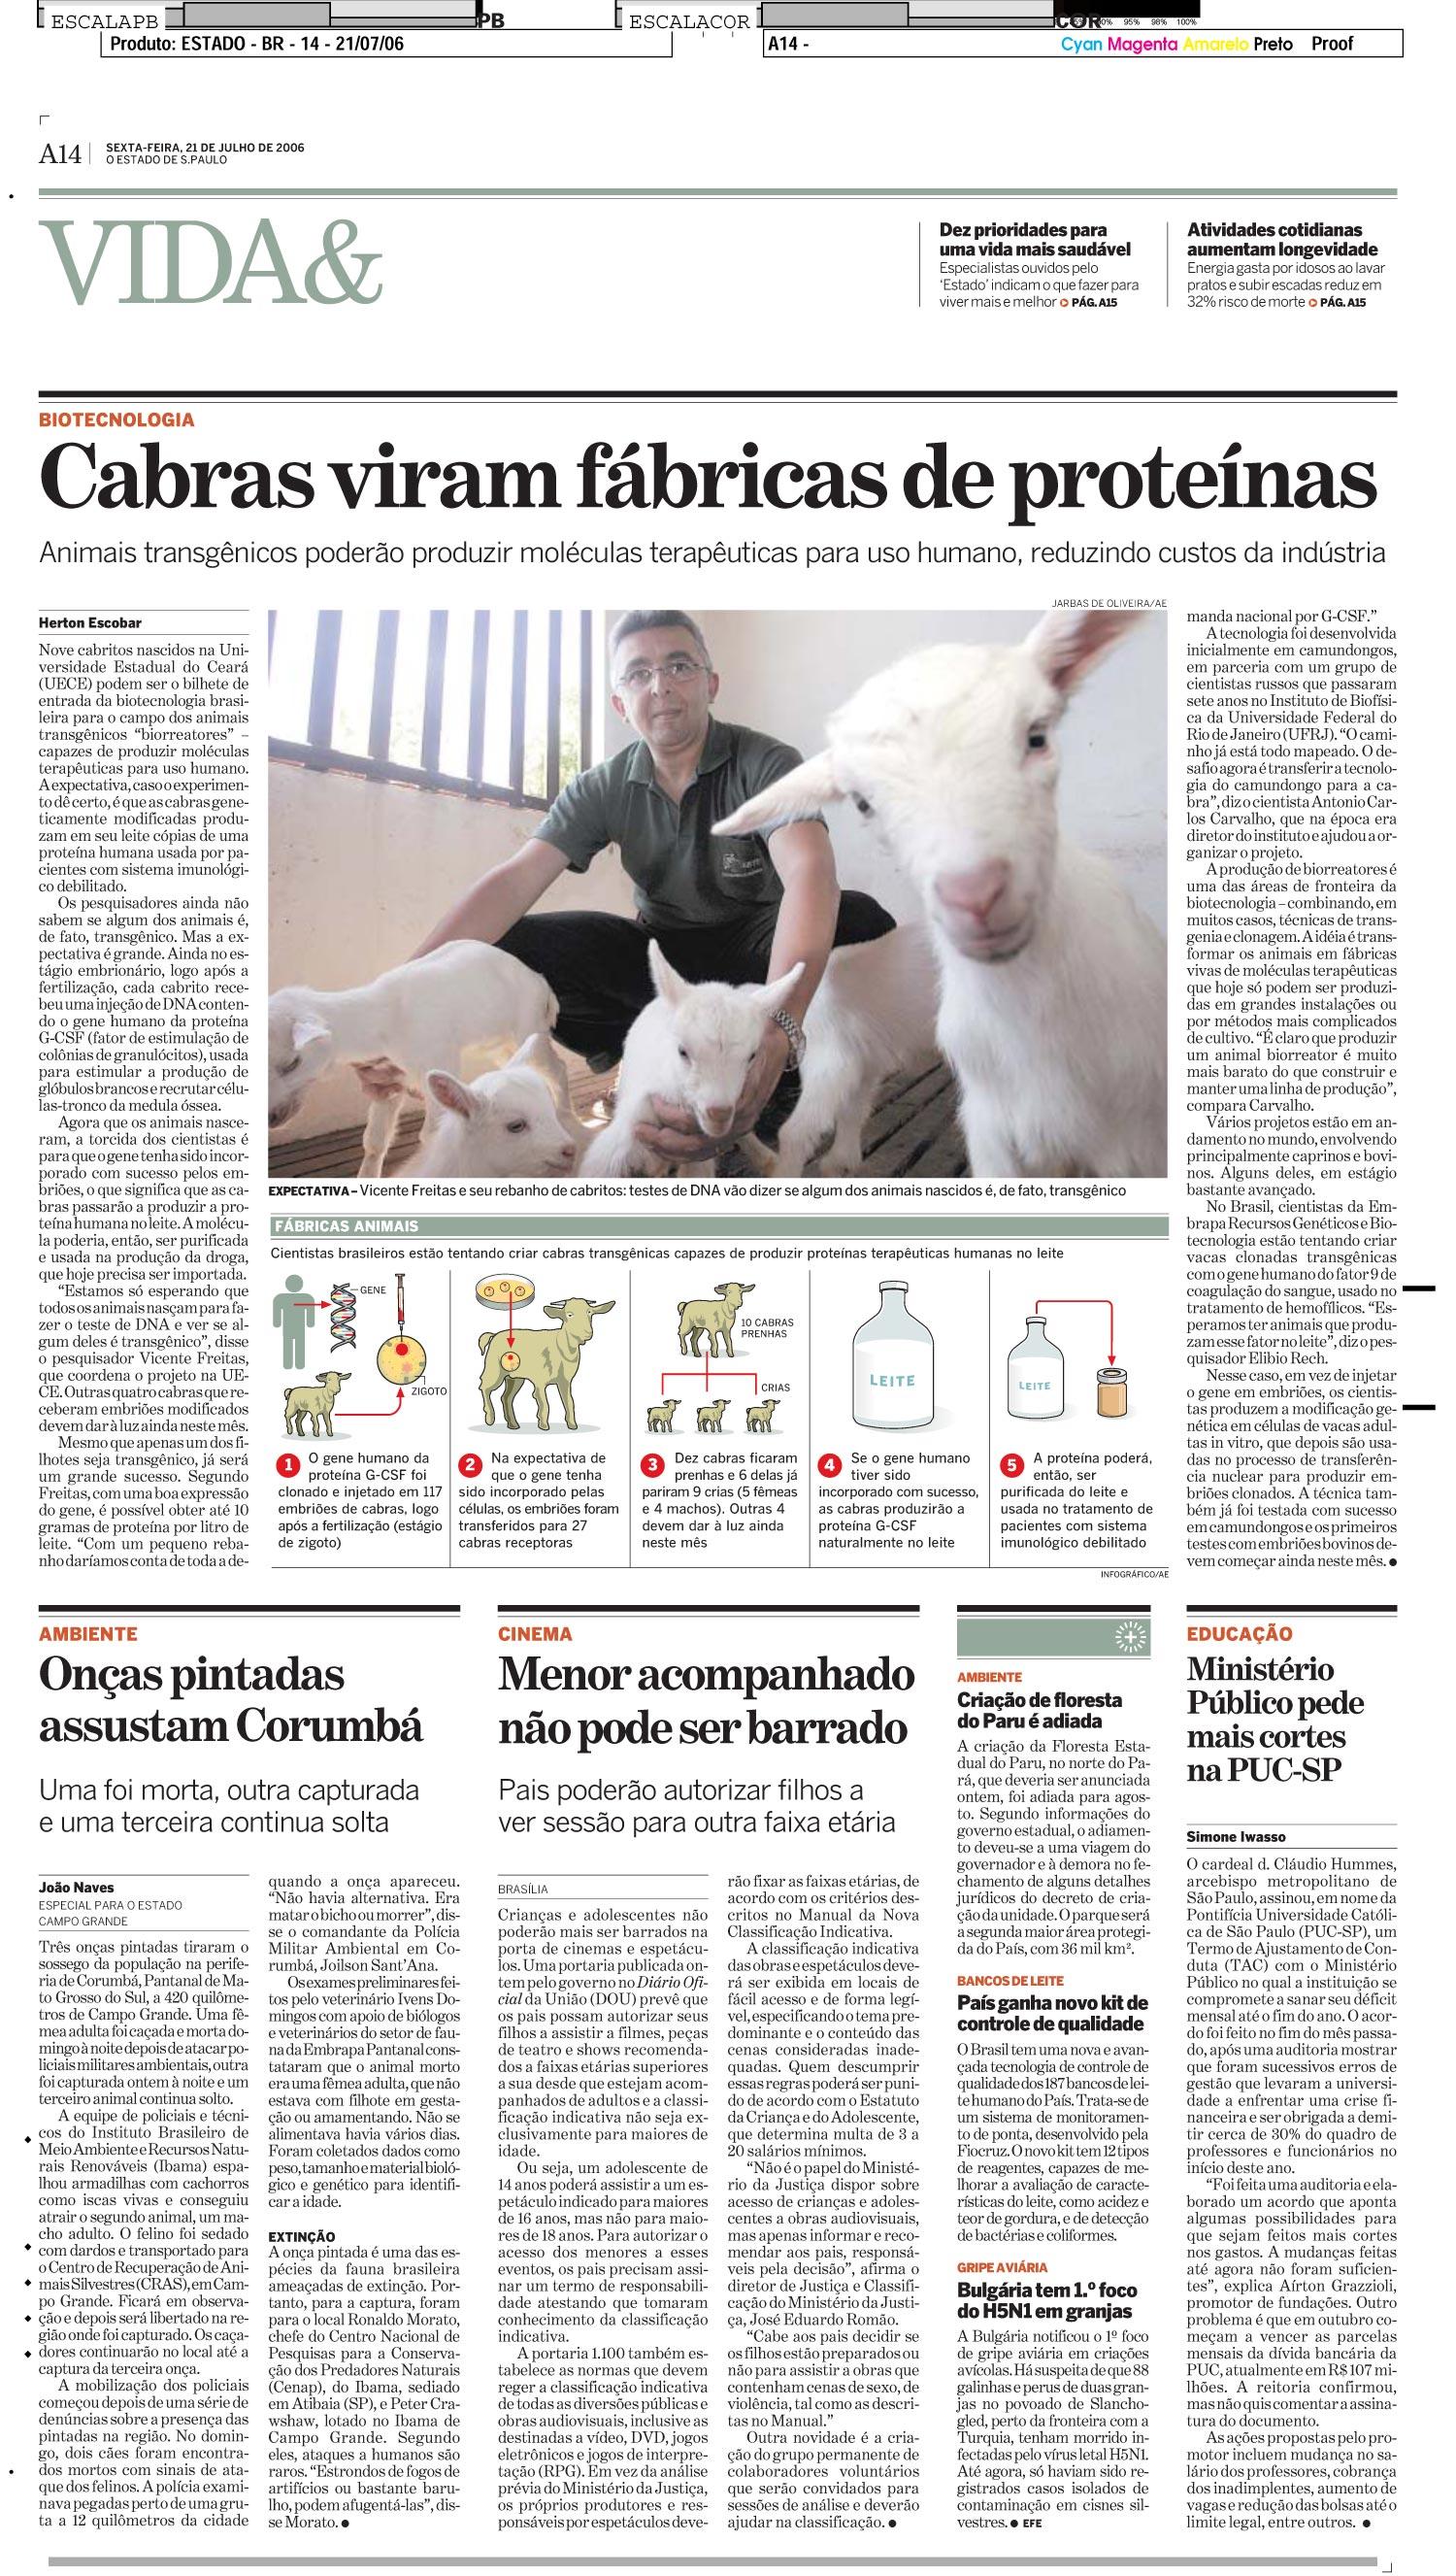 Cabras viram fábricas de proteínas